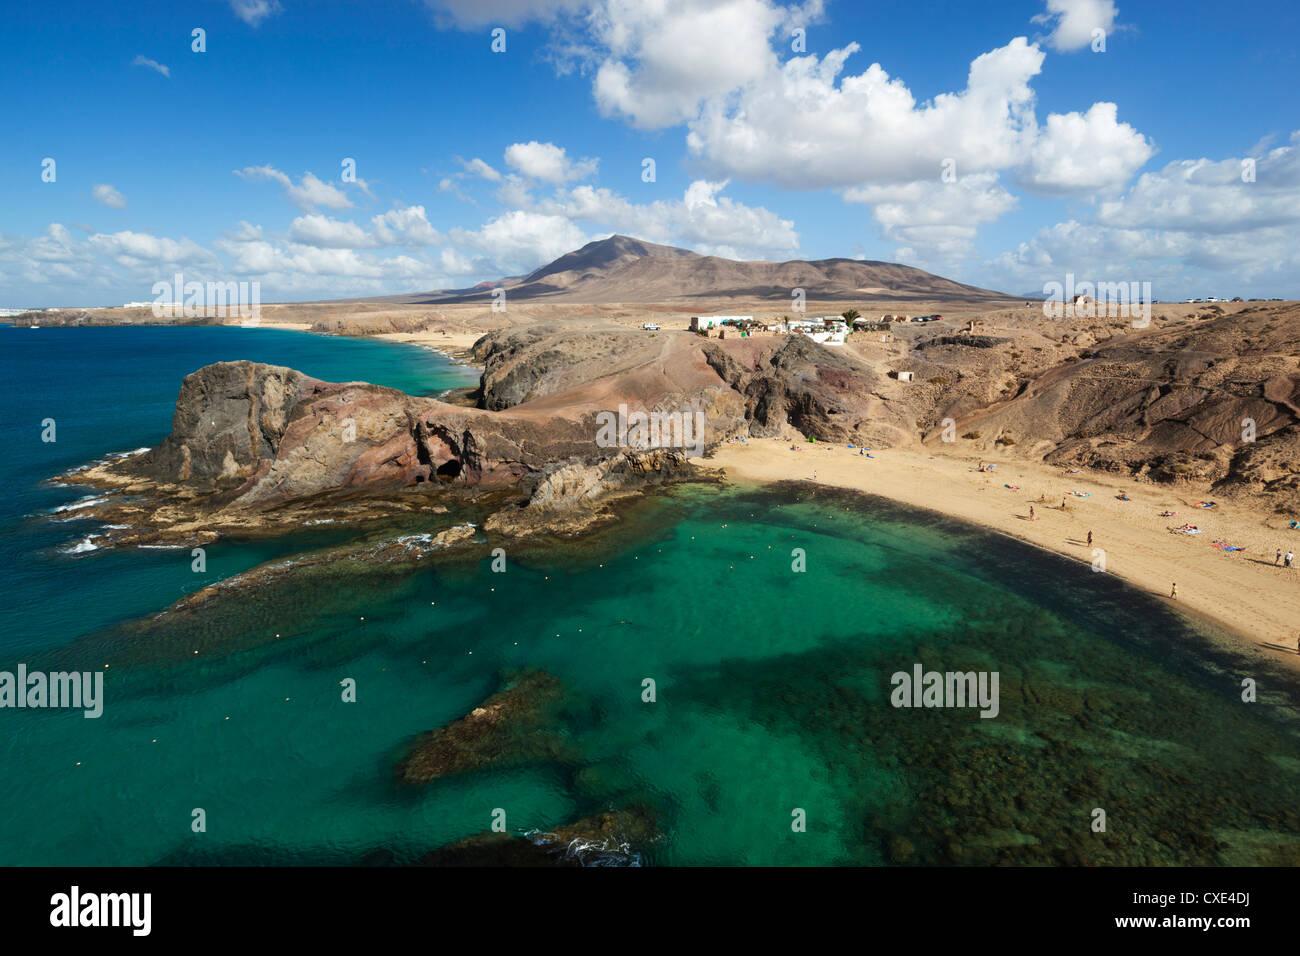 Playa del Papagayo, near Playa Blanca, Lanzarote, Canary Islands, Spain - Stock Image